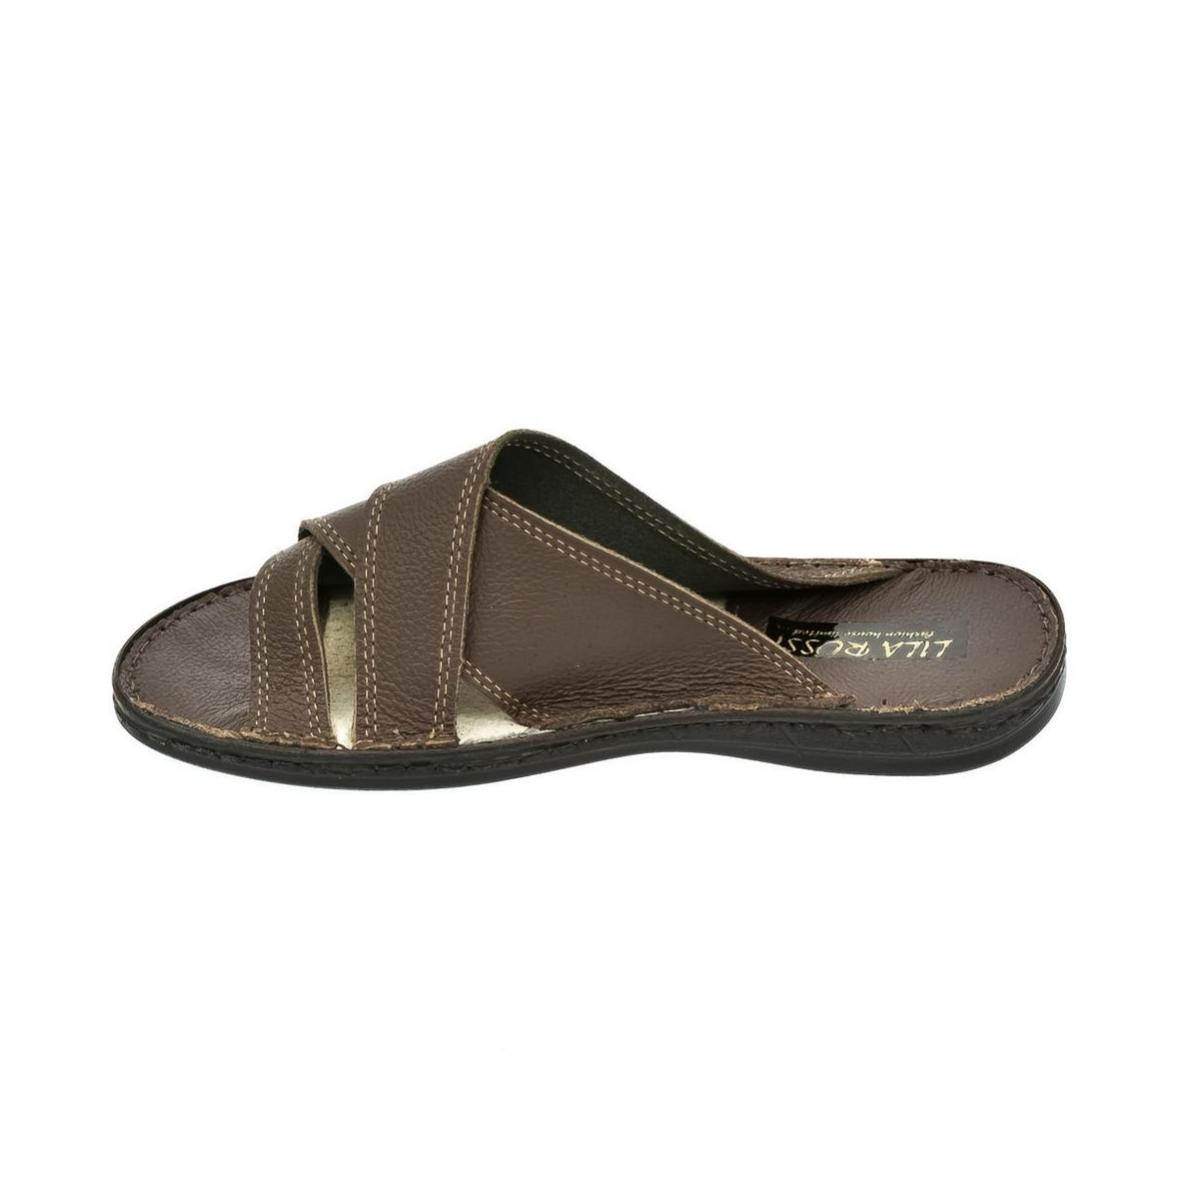 effb30f33a4bd Pánske hnedé papuče ARON | Johnc.sk